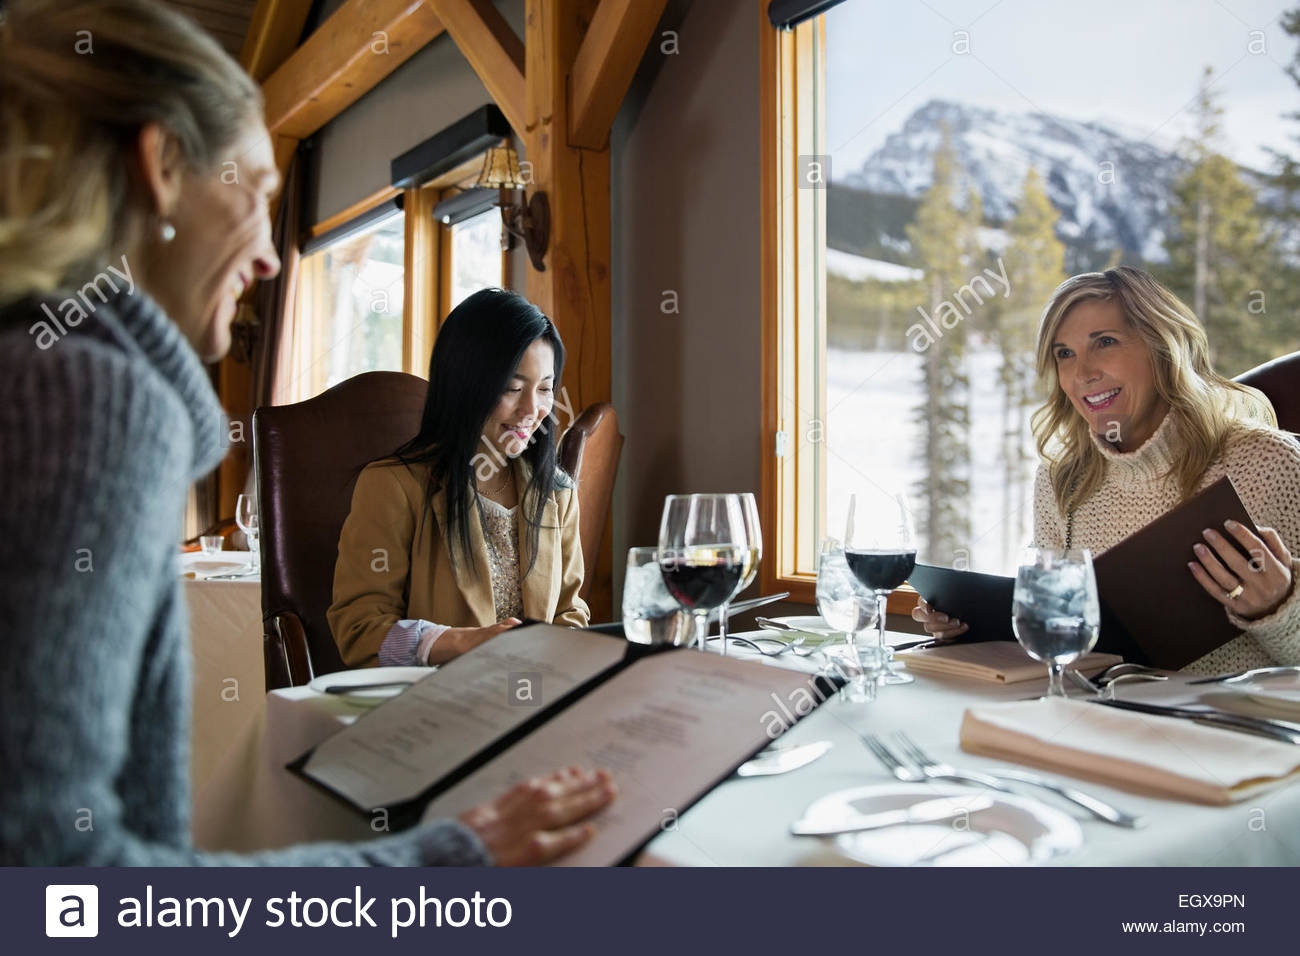 Women looking at menus at restaurant table - Stock Image